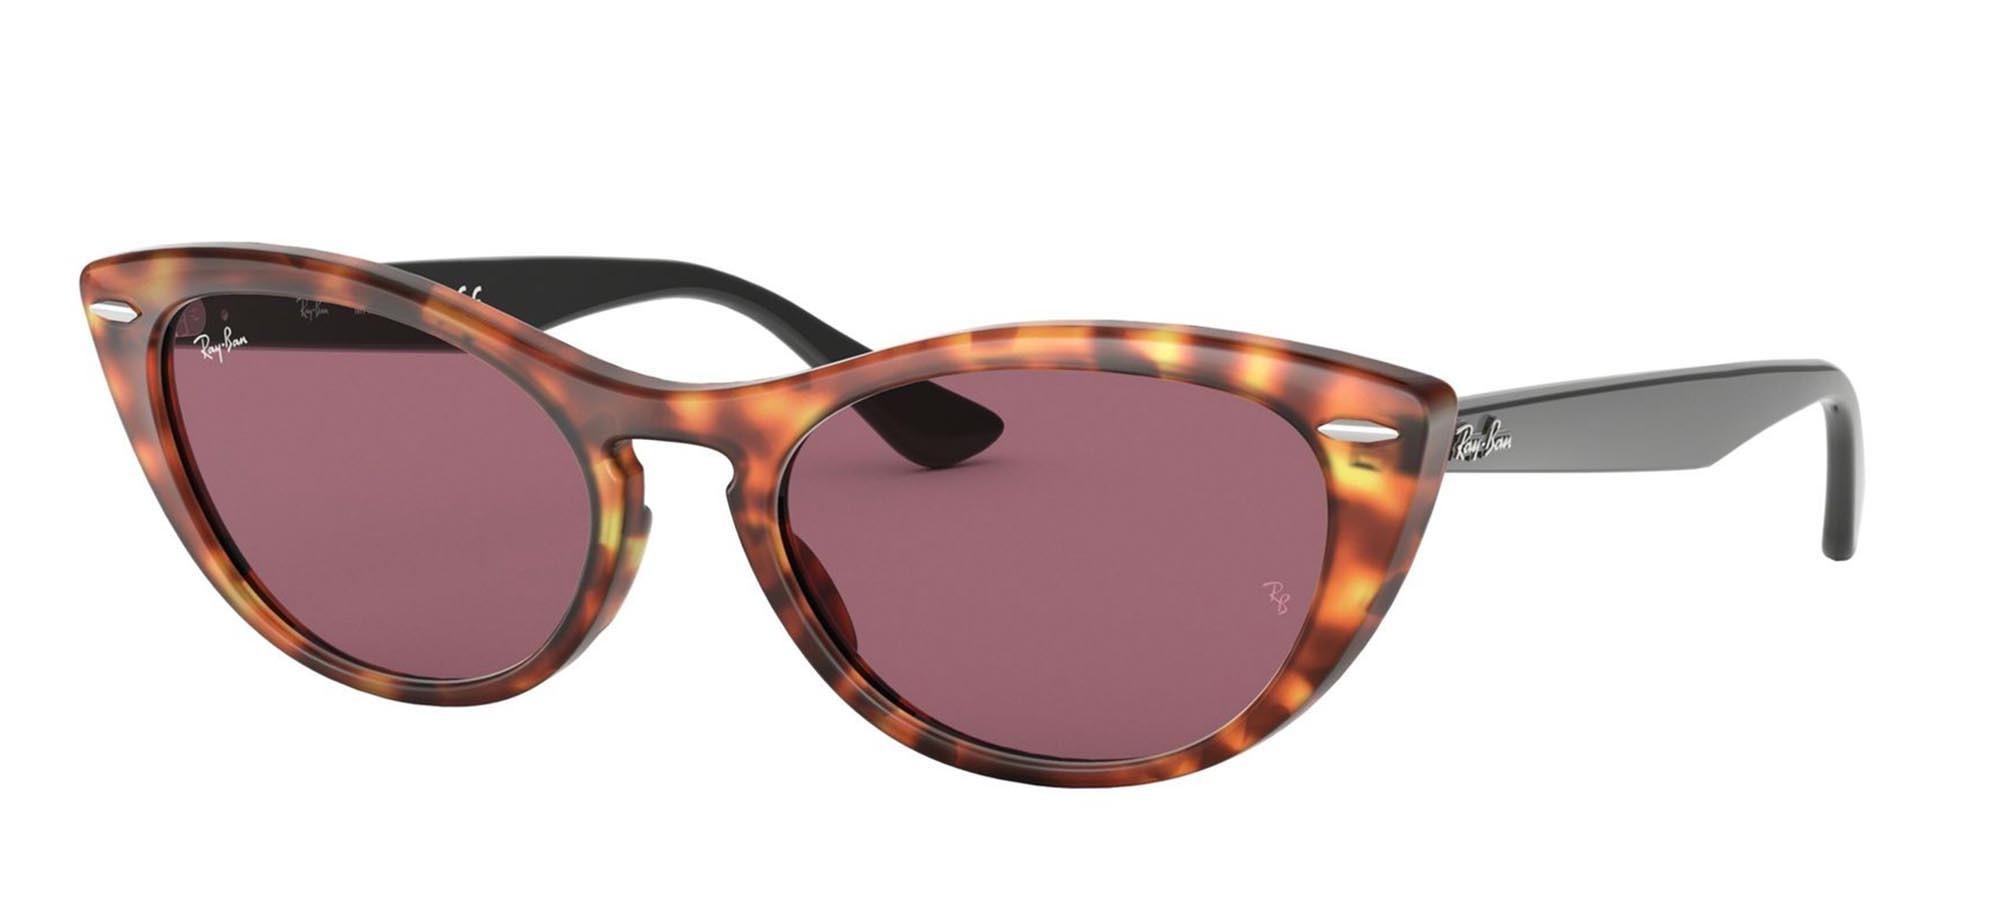 Ray-Ban zonnebrillen NINA RB 4314N